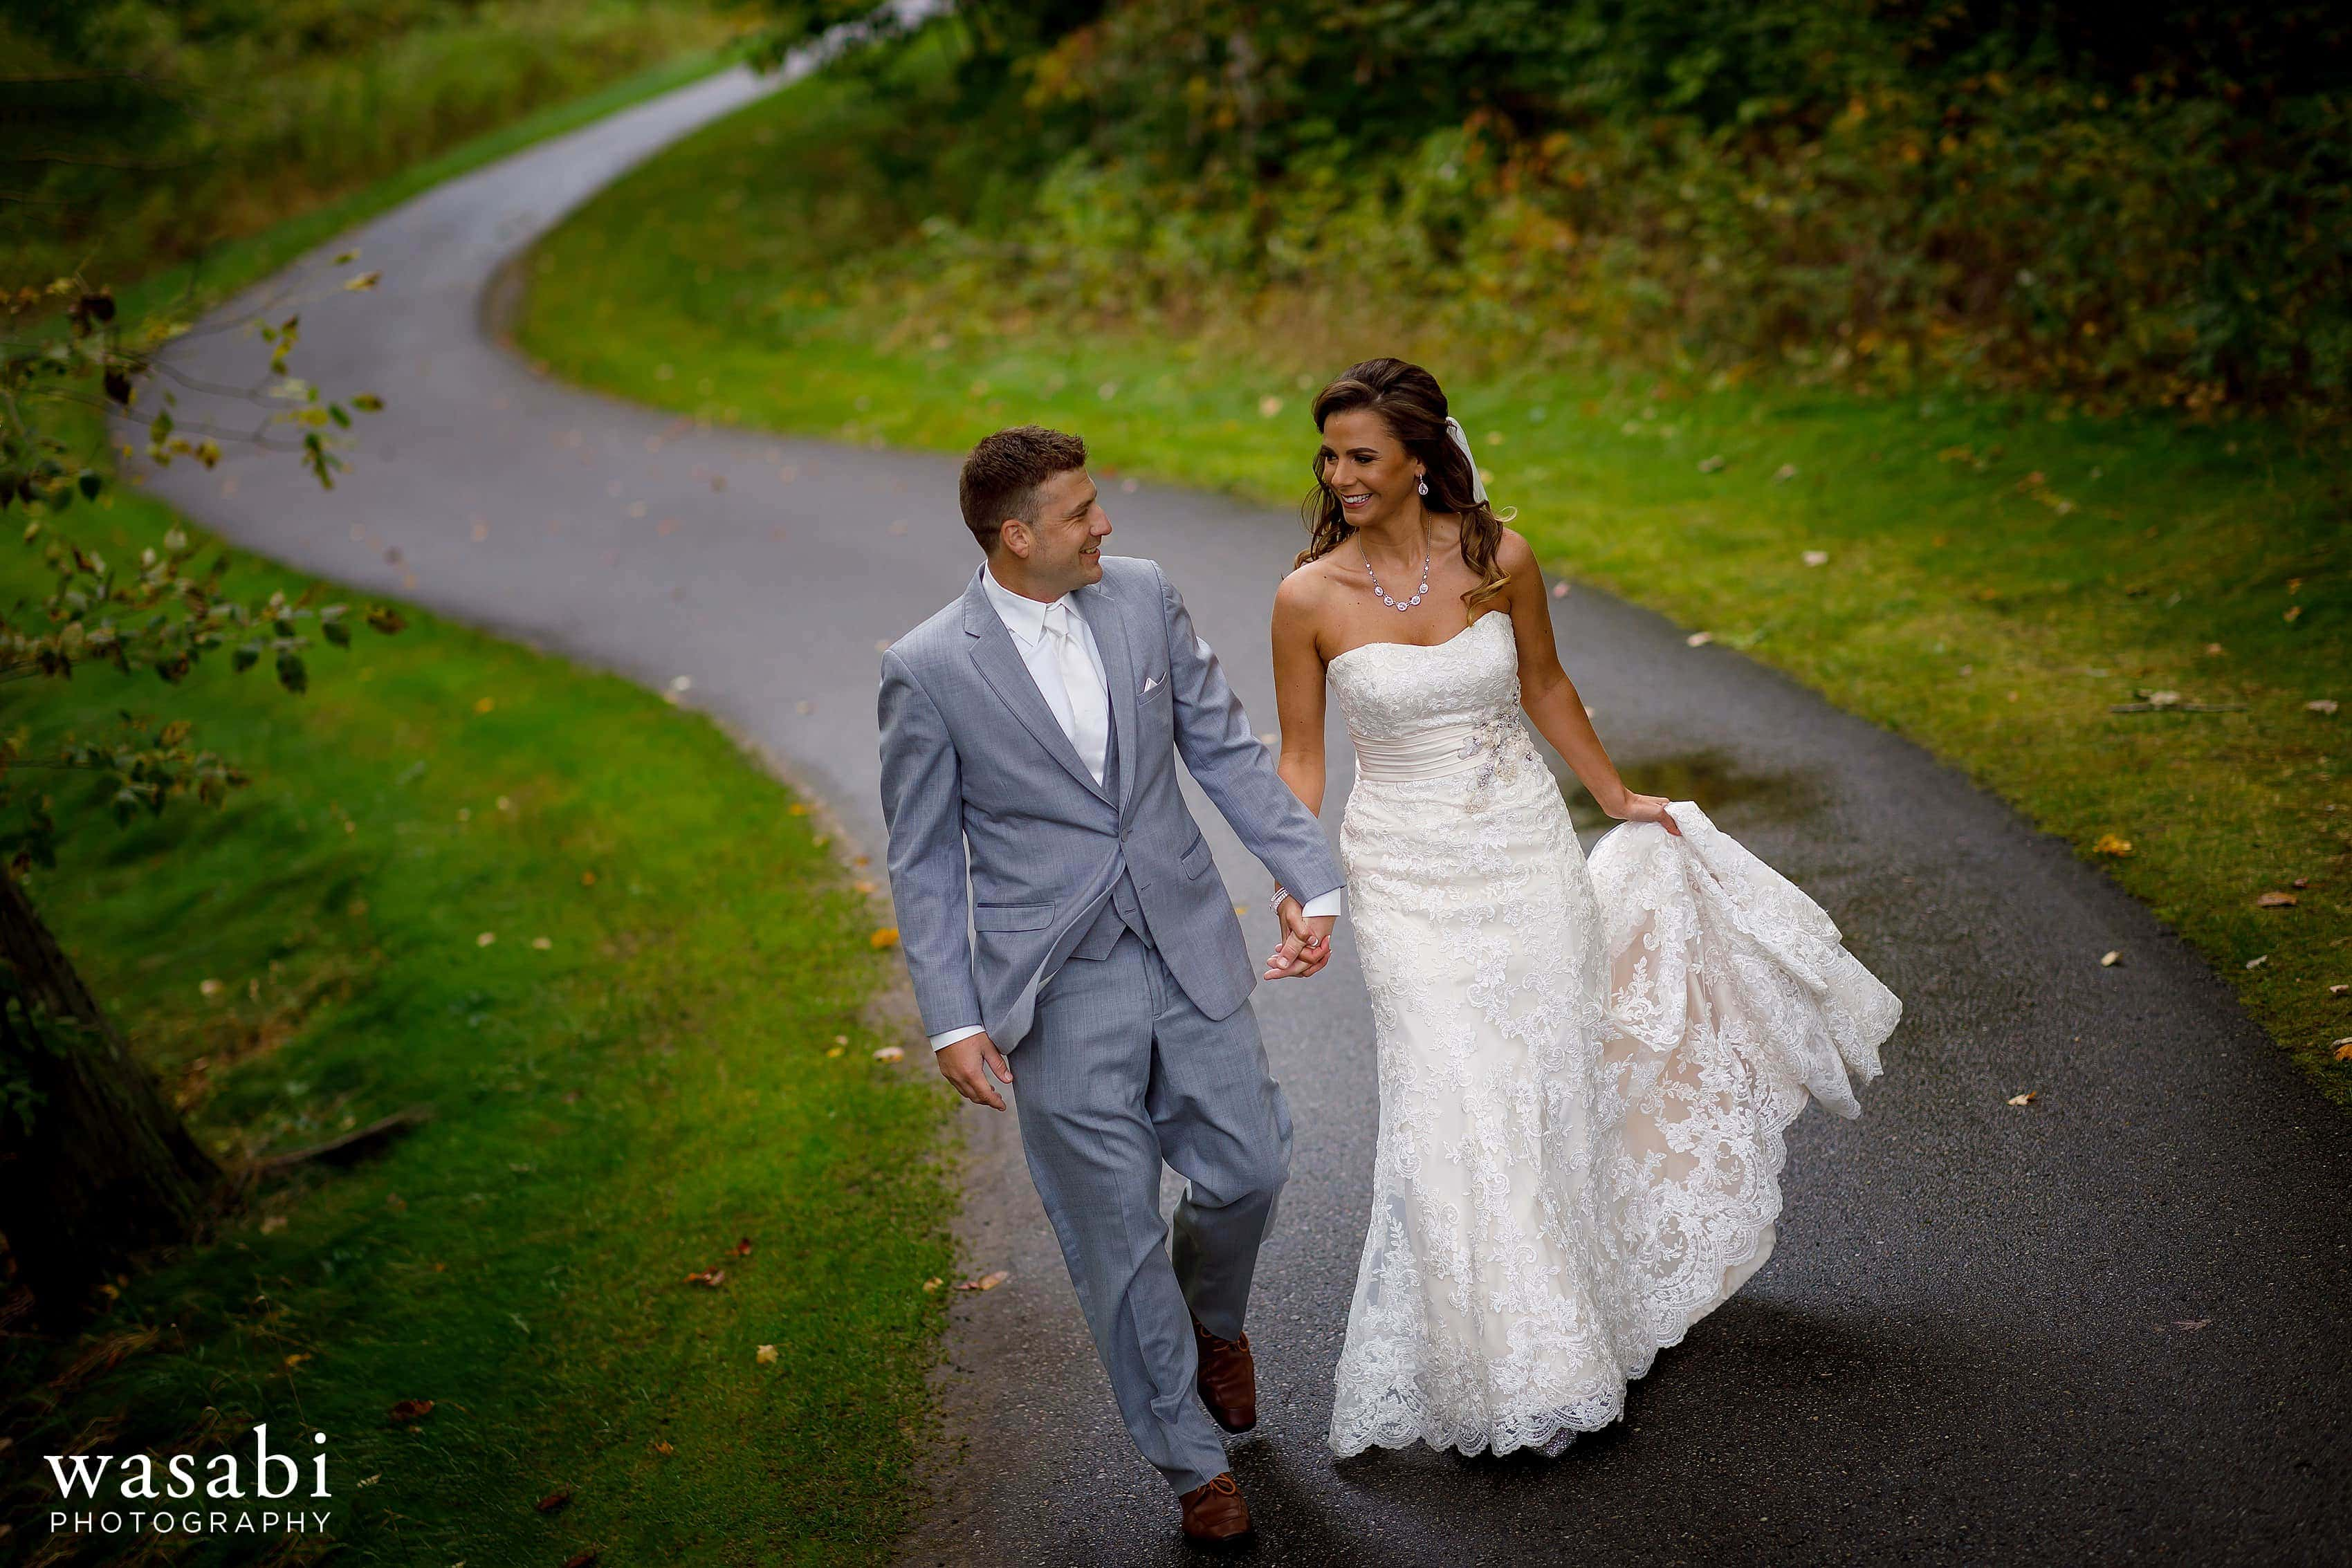 Bride and groom walk down windy road at Buck's Run Golf Club in Mount Pleasant, Michigan.